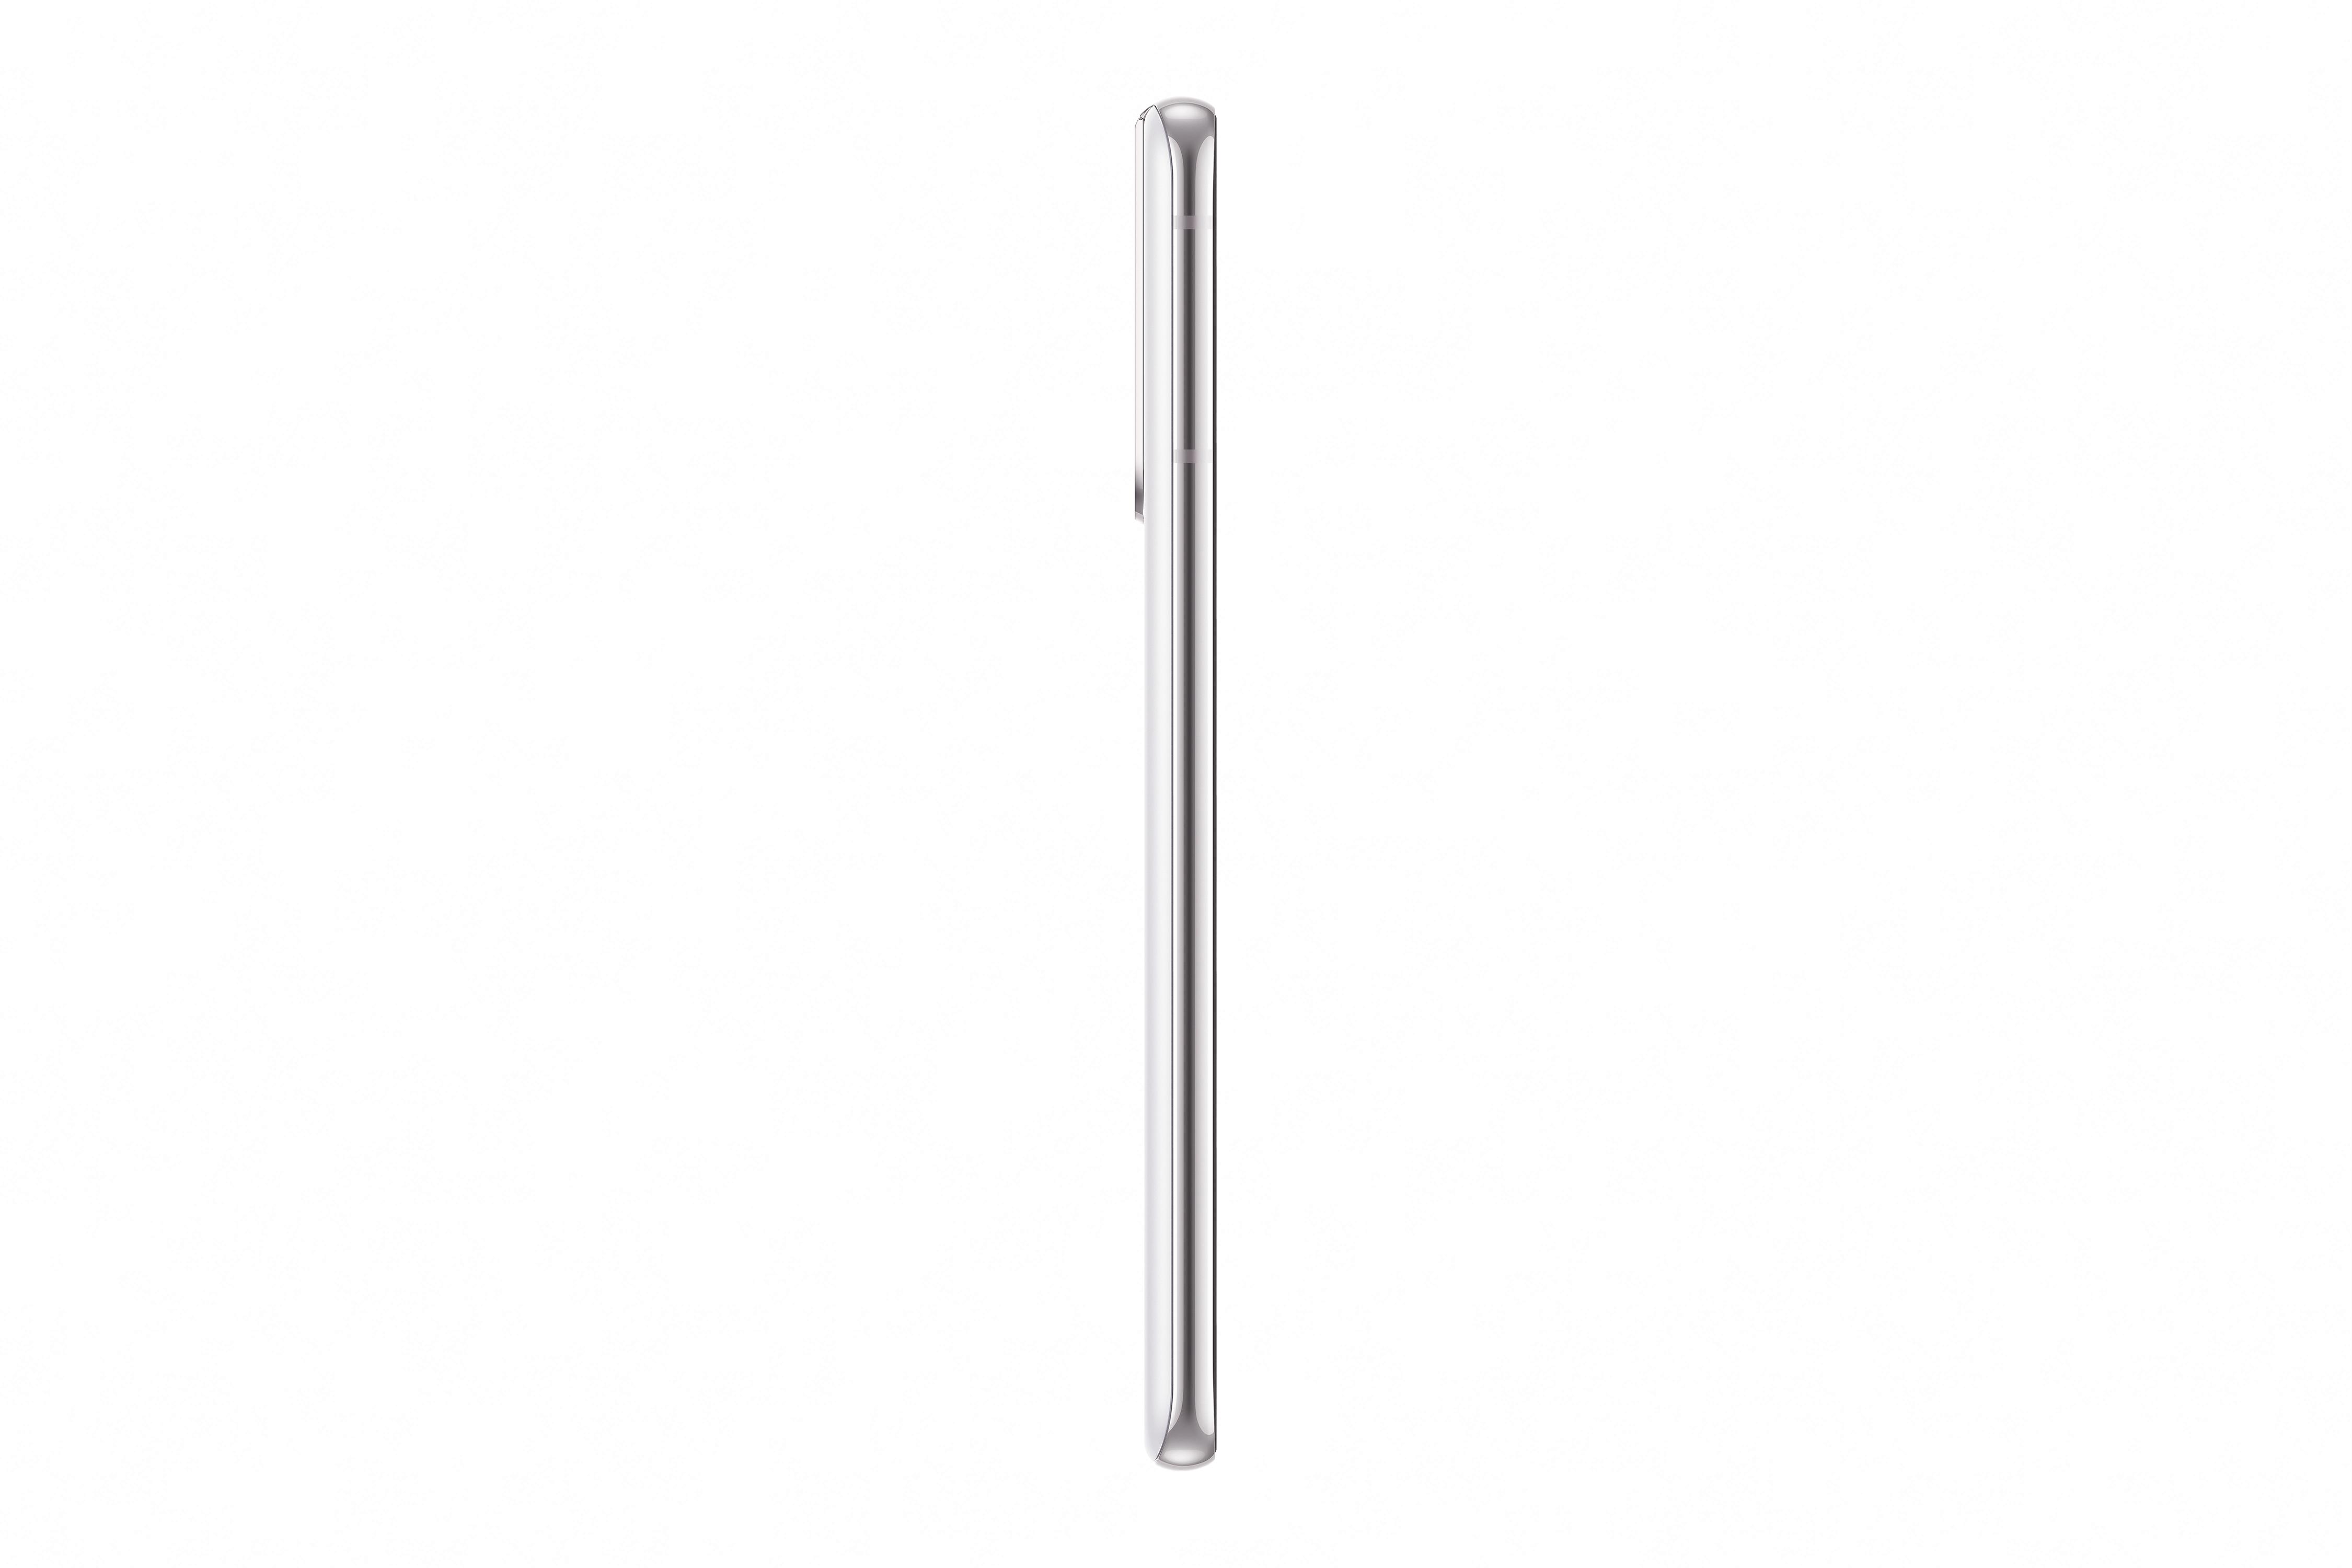 Samsung Galaxy S21 DUAL (SM-G991B) White - 5